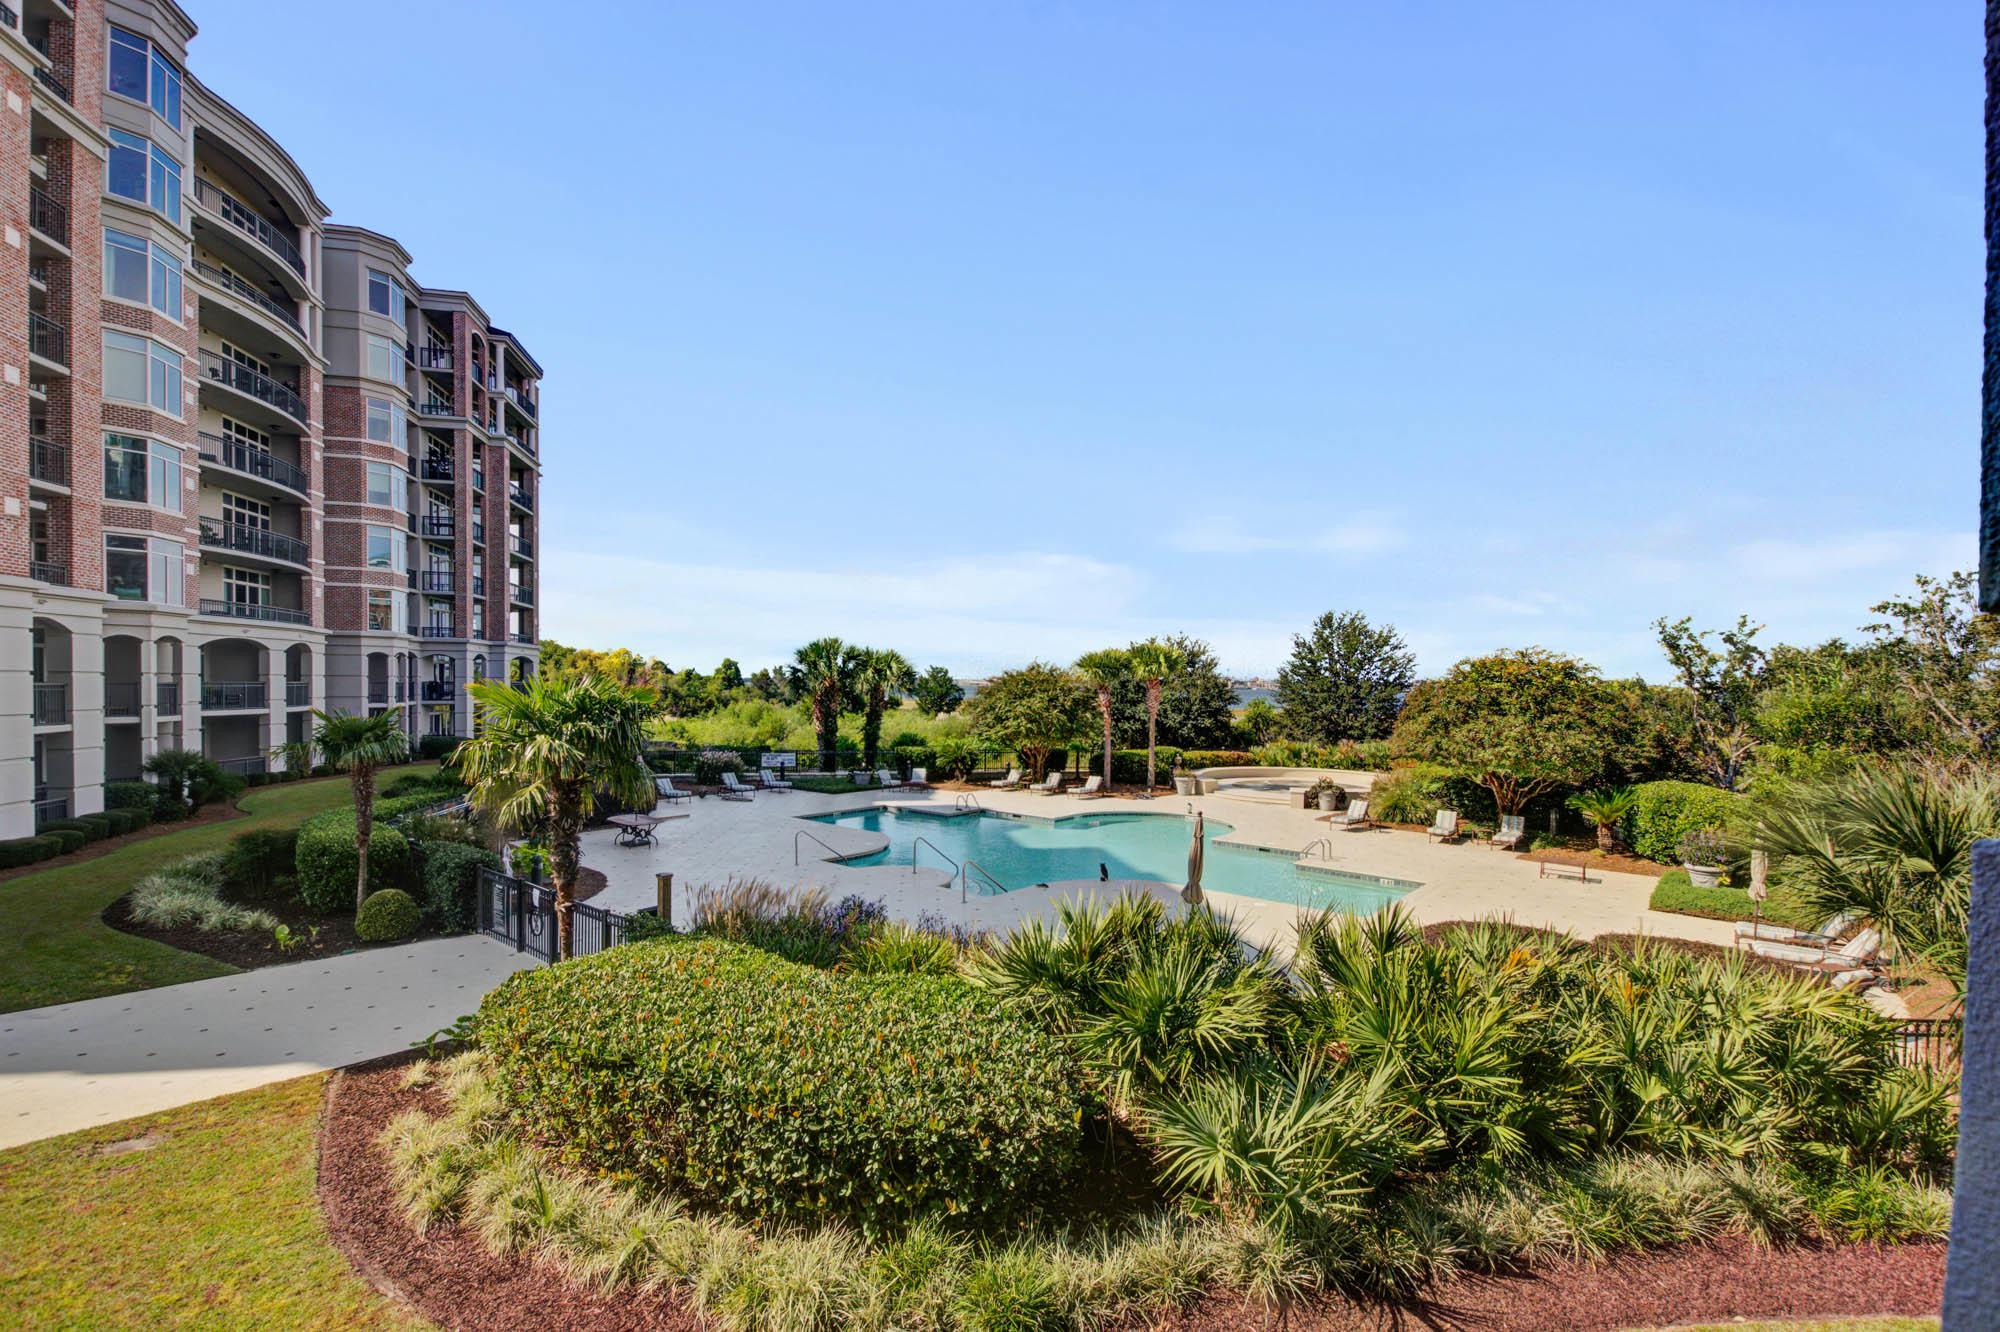 Renaissance On Chas Harbor Homes For Sale - 231 Plaza, Mount Pleasant, SC - 2